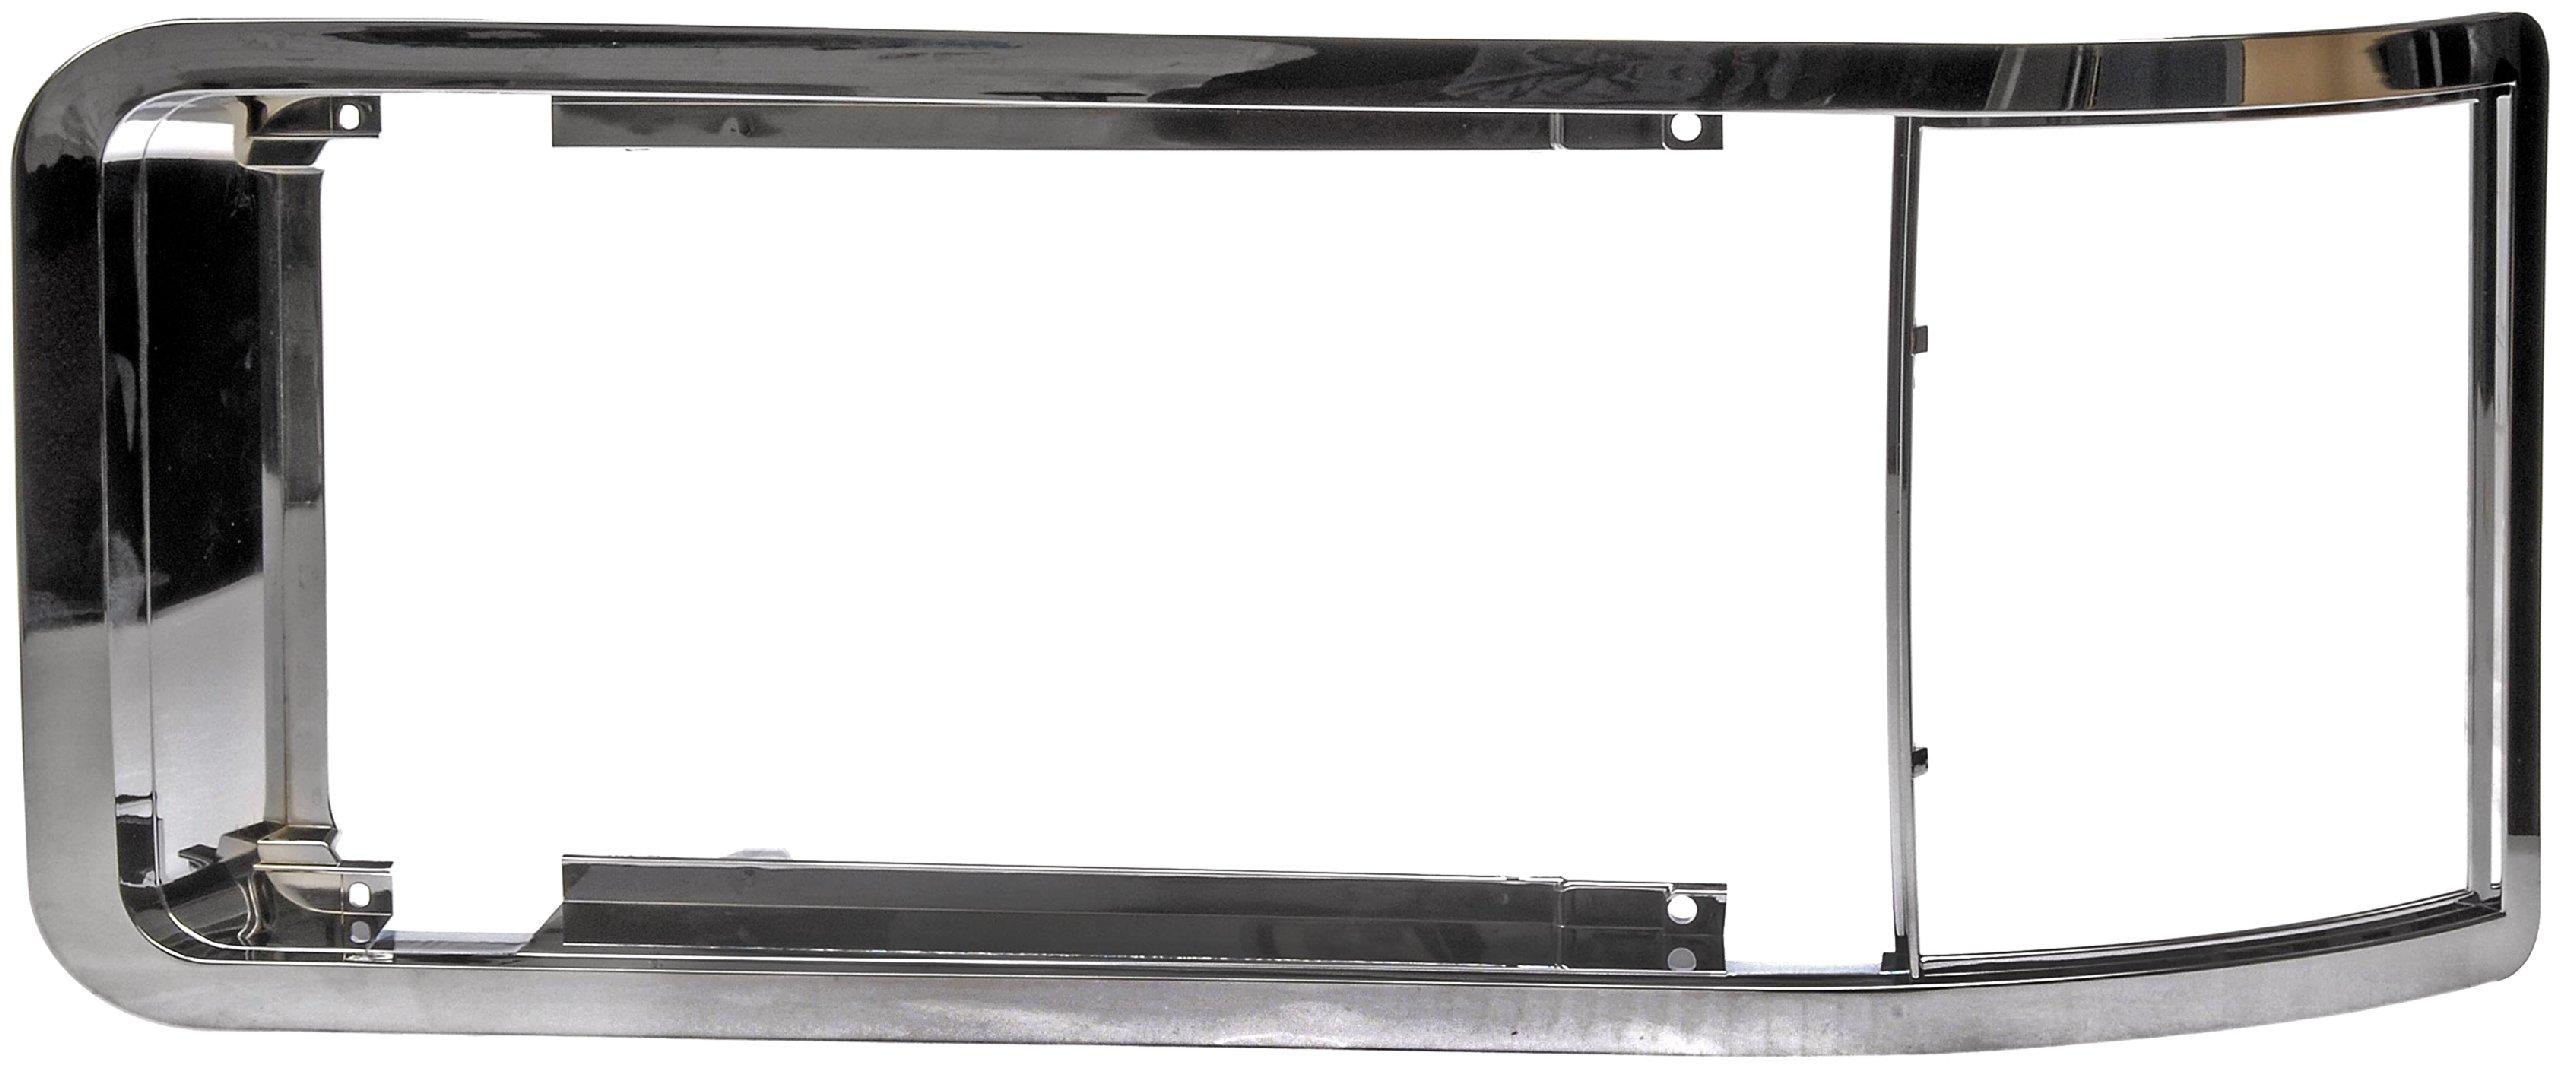 Dorman 889-5501 Mack Headlight Bezel by Dorman